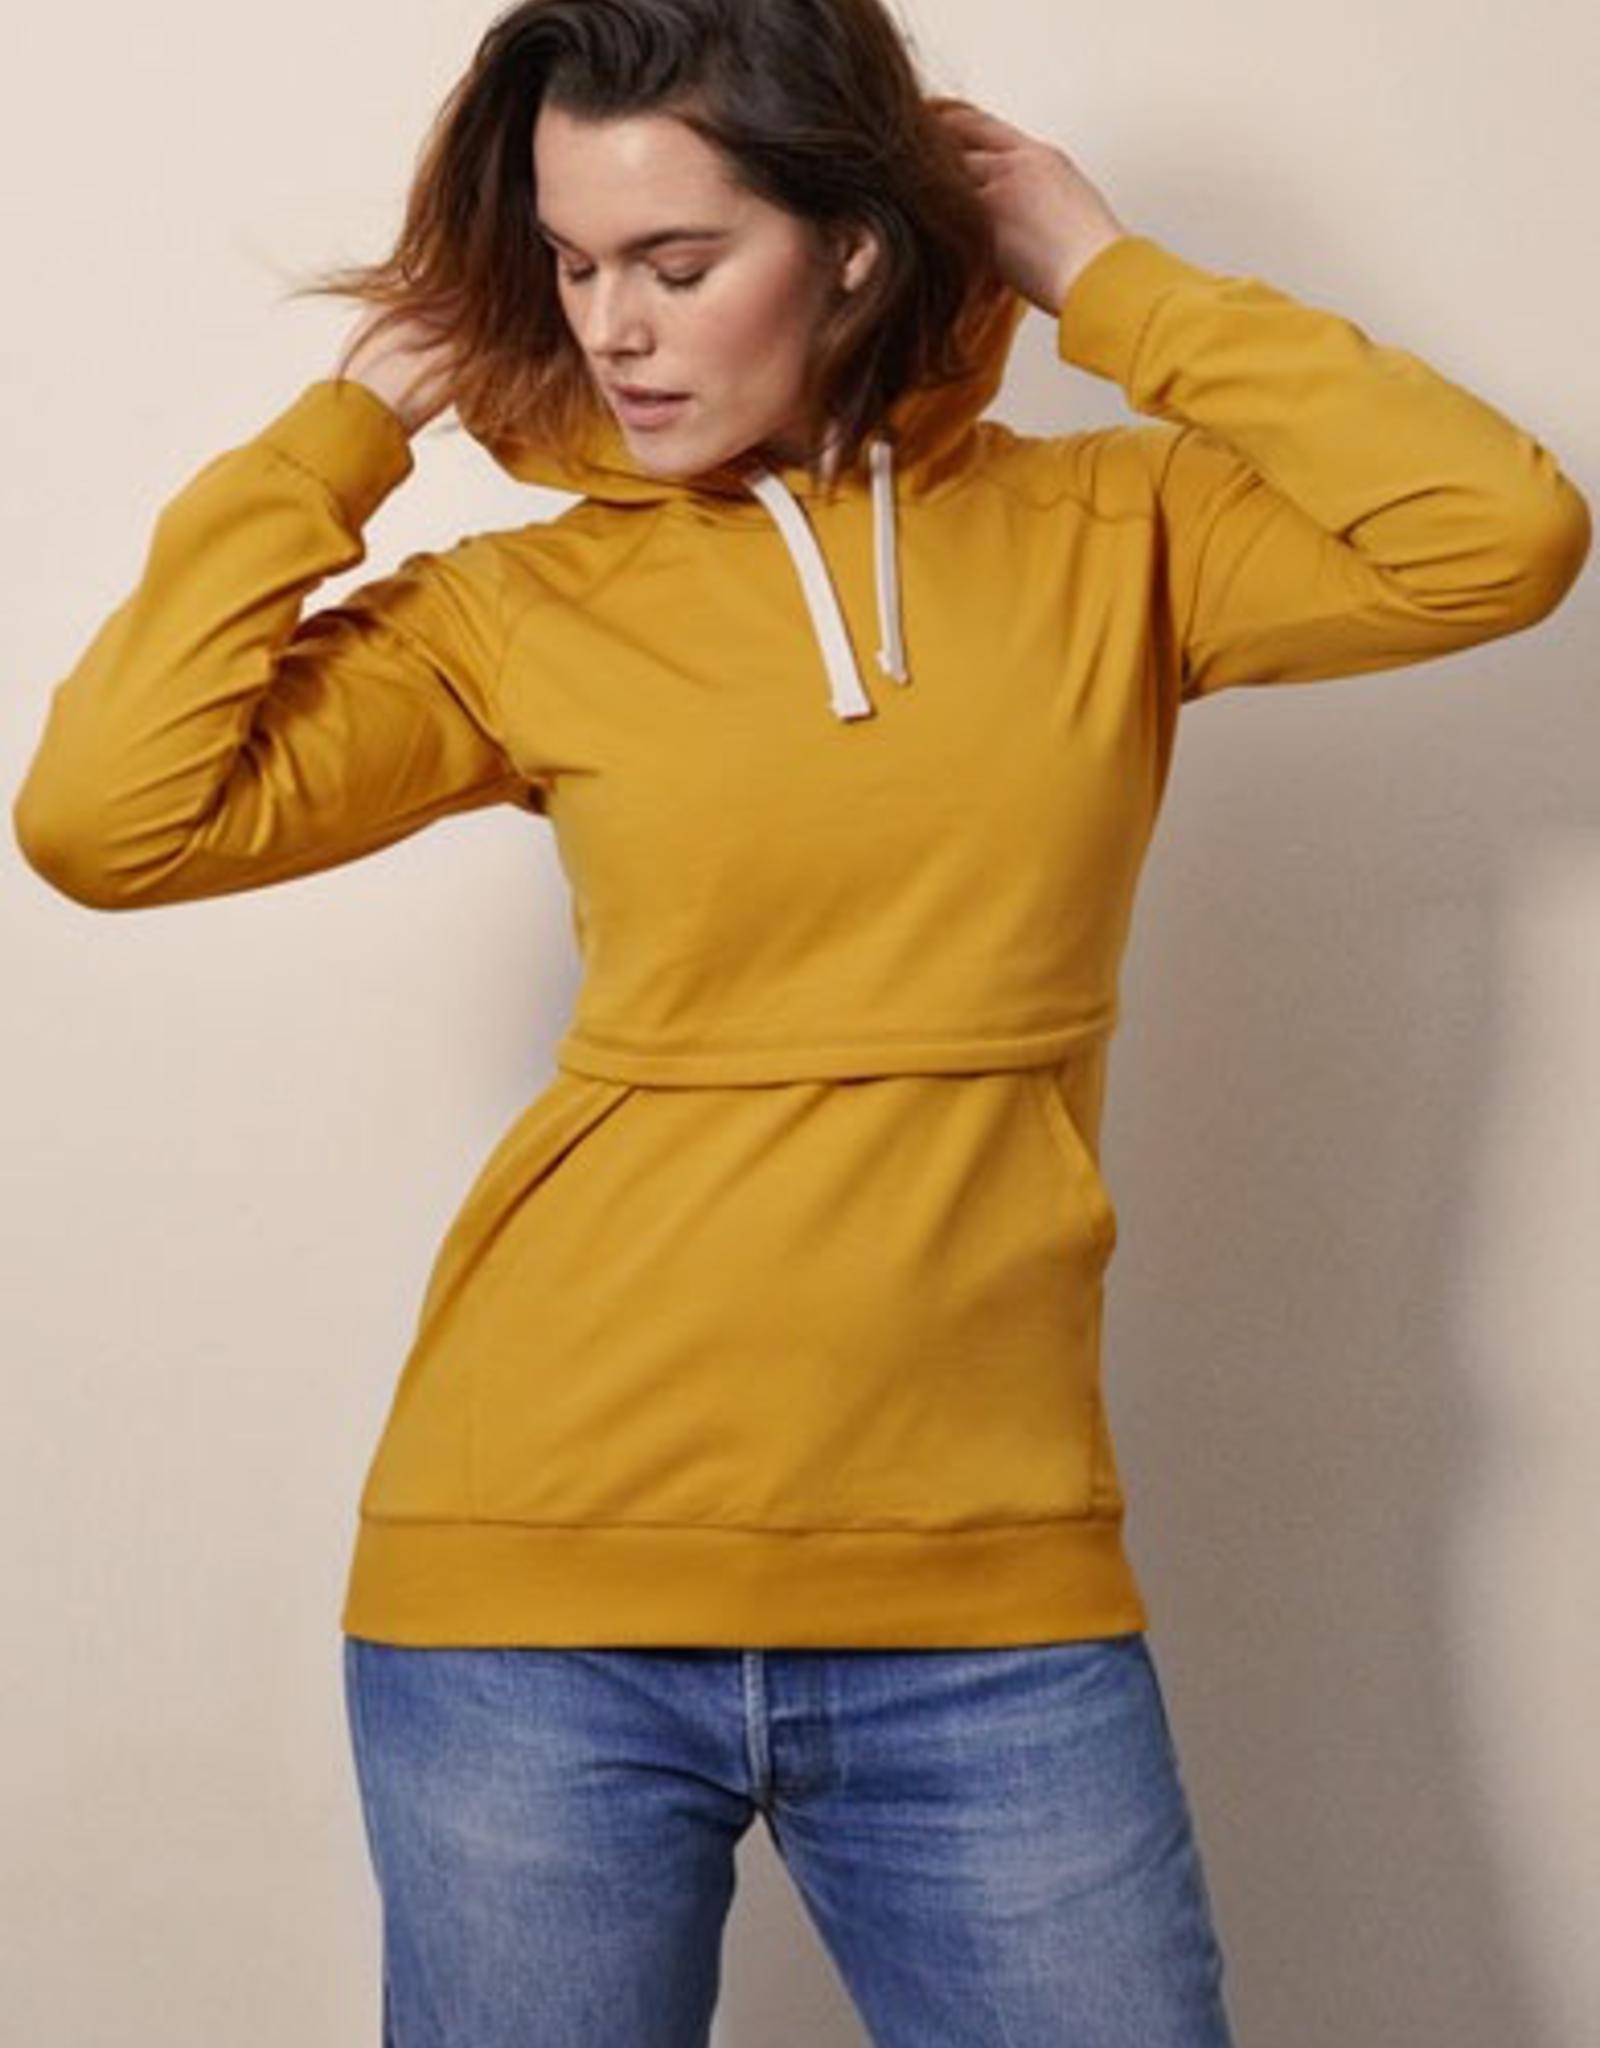 Boob Design B-Warmer Nursing Hoodie in Amber